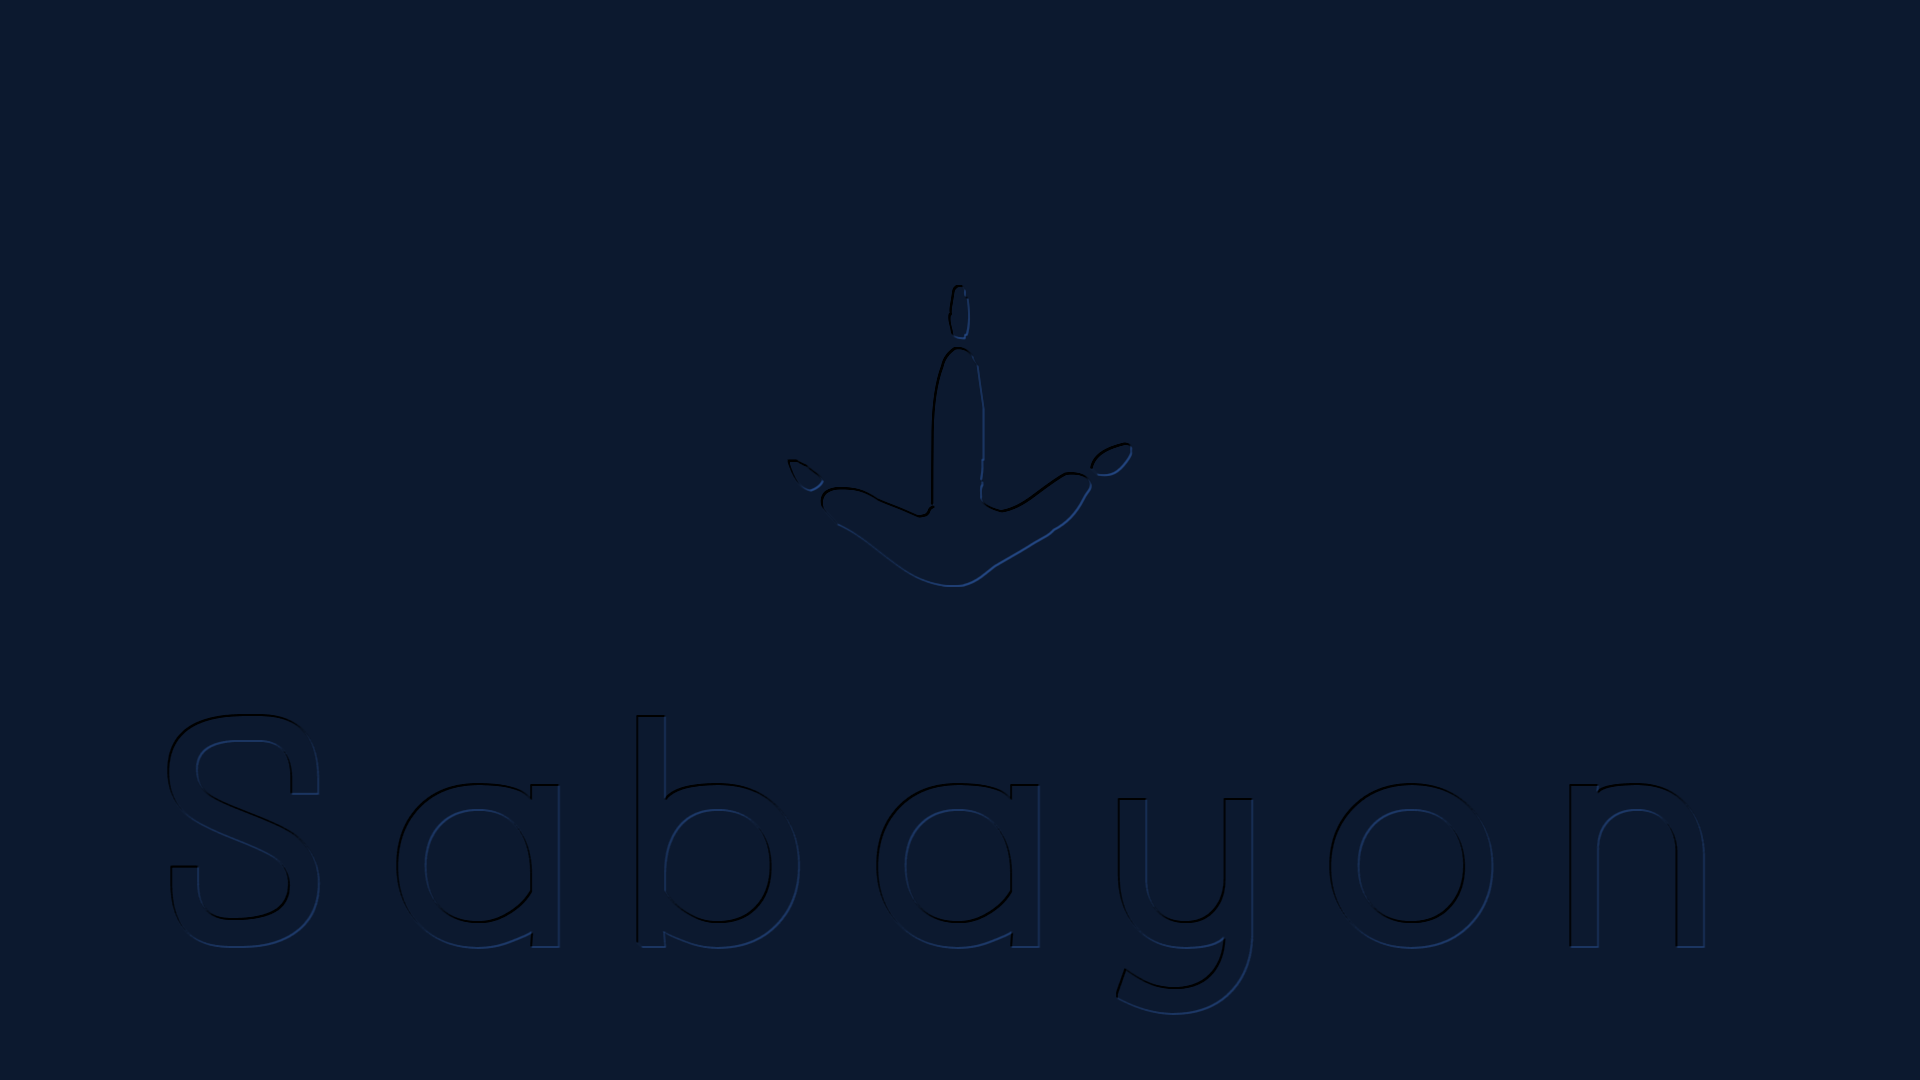 Sabayon (Original) Linux Wallpaper blue by Lukazoid